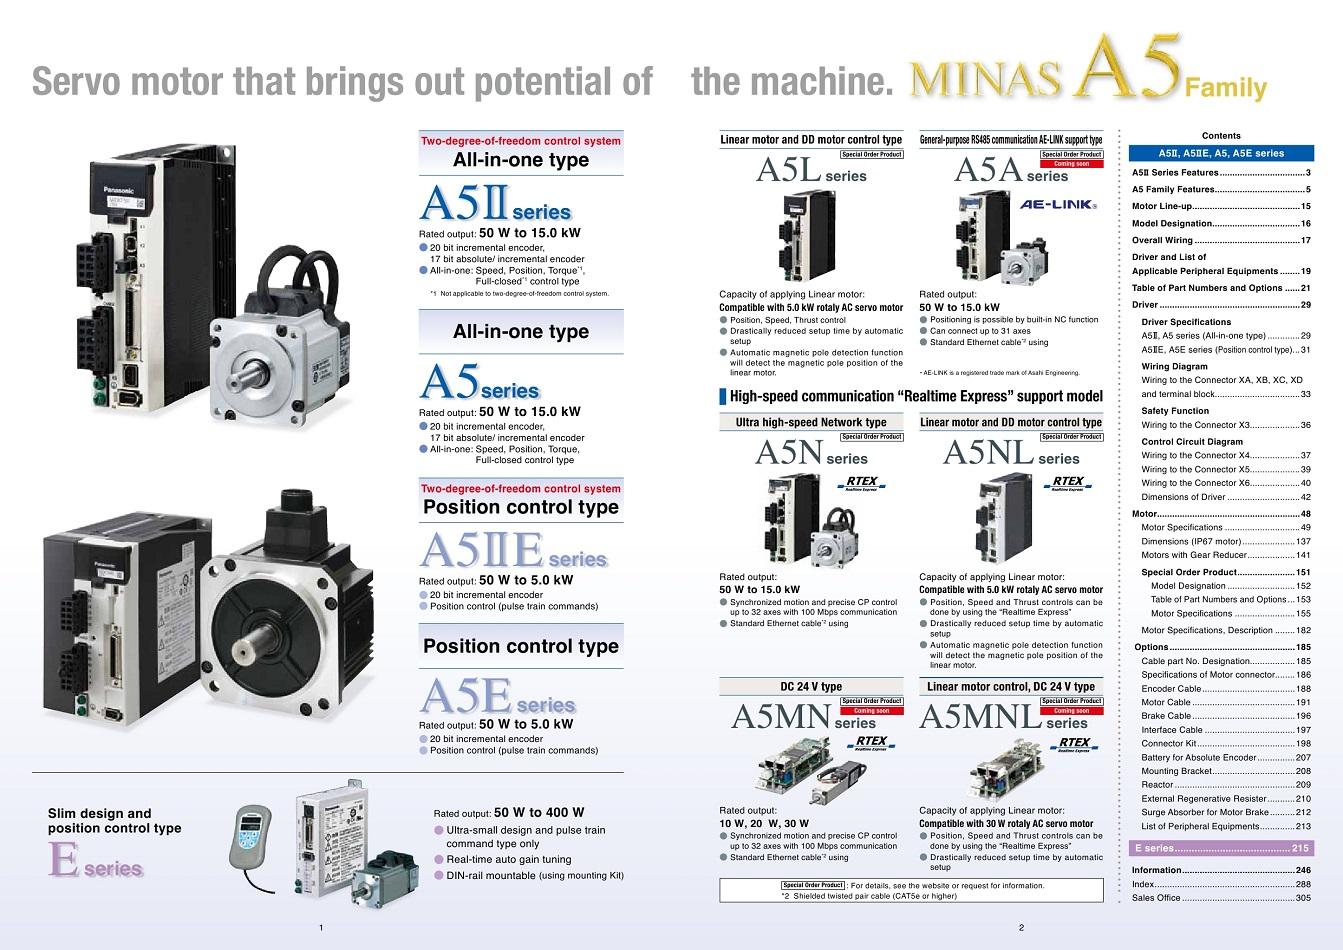 Melso Otomasyon A Atksu Artma Tesisi Otomasyonu Me Suyu Panasonic Servo Motor Wiring Diagram Safety Fonksiyonu Sayesinde A5 Serisi Kullanan Bir Makine Avrupa Normlarnda Motora Ulam Oluyor